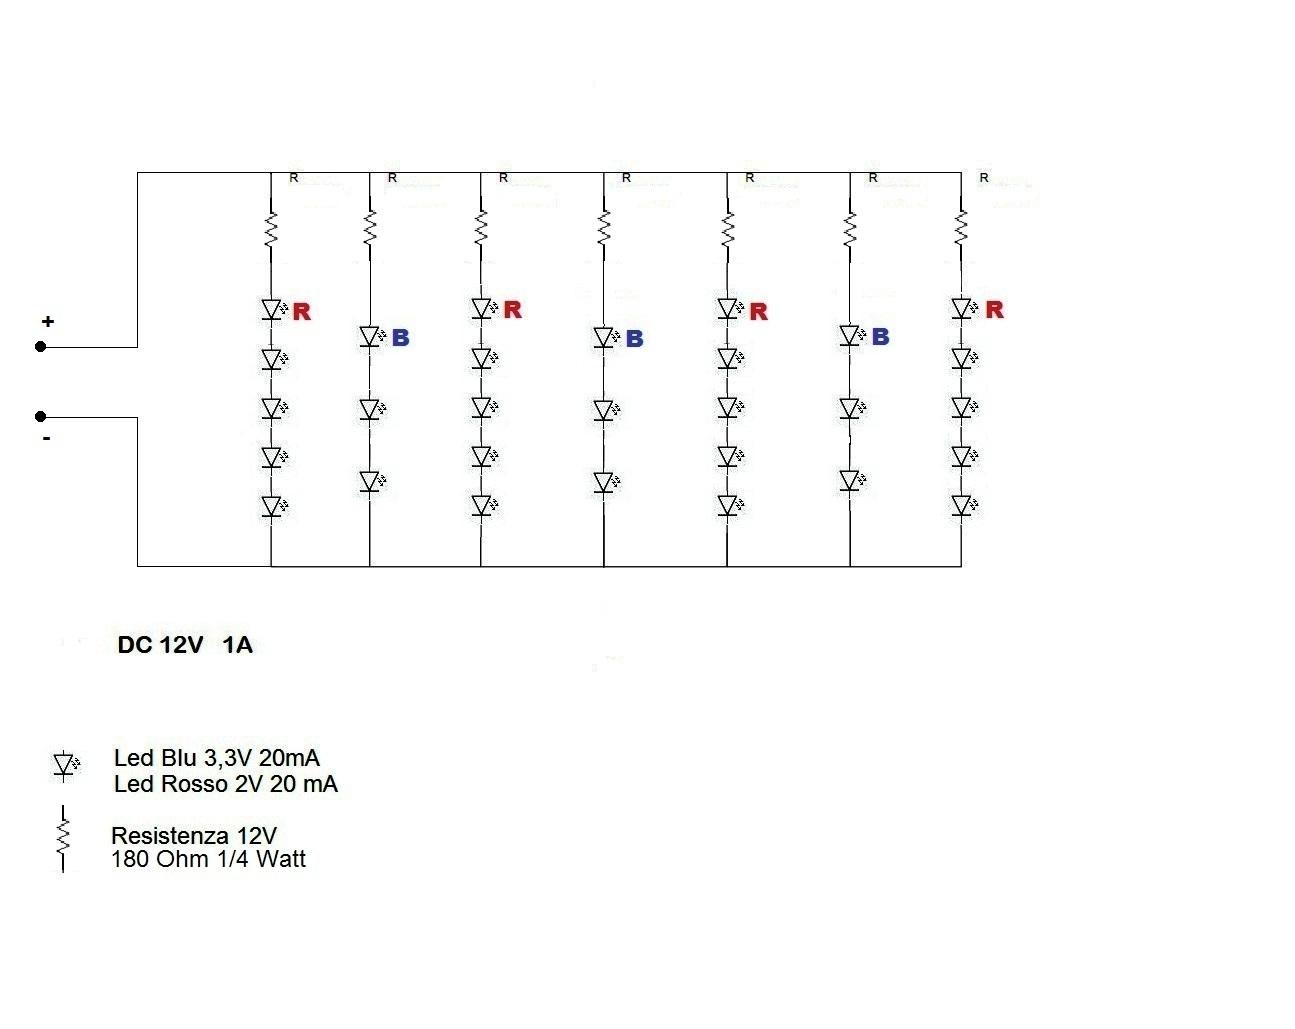 Schema Elettrico Dimmer Per Led 220v : Wutel ecoledlamp